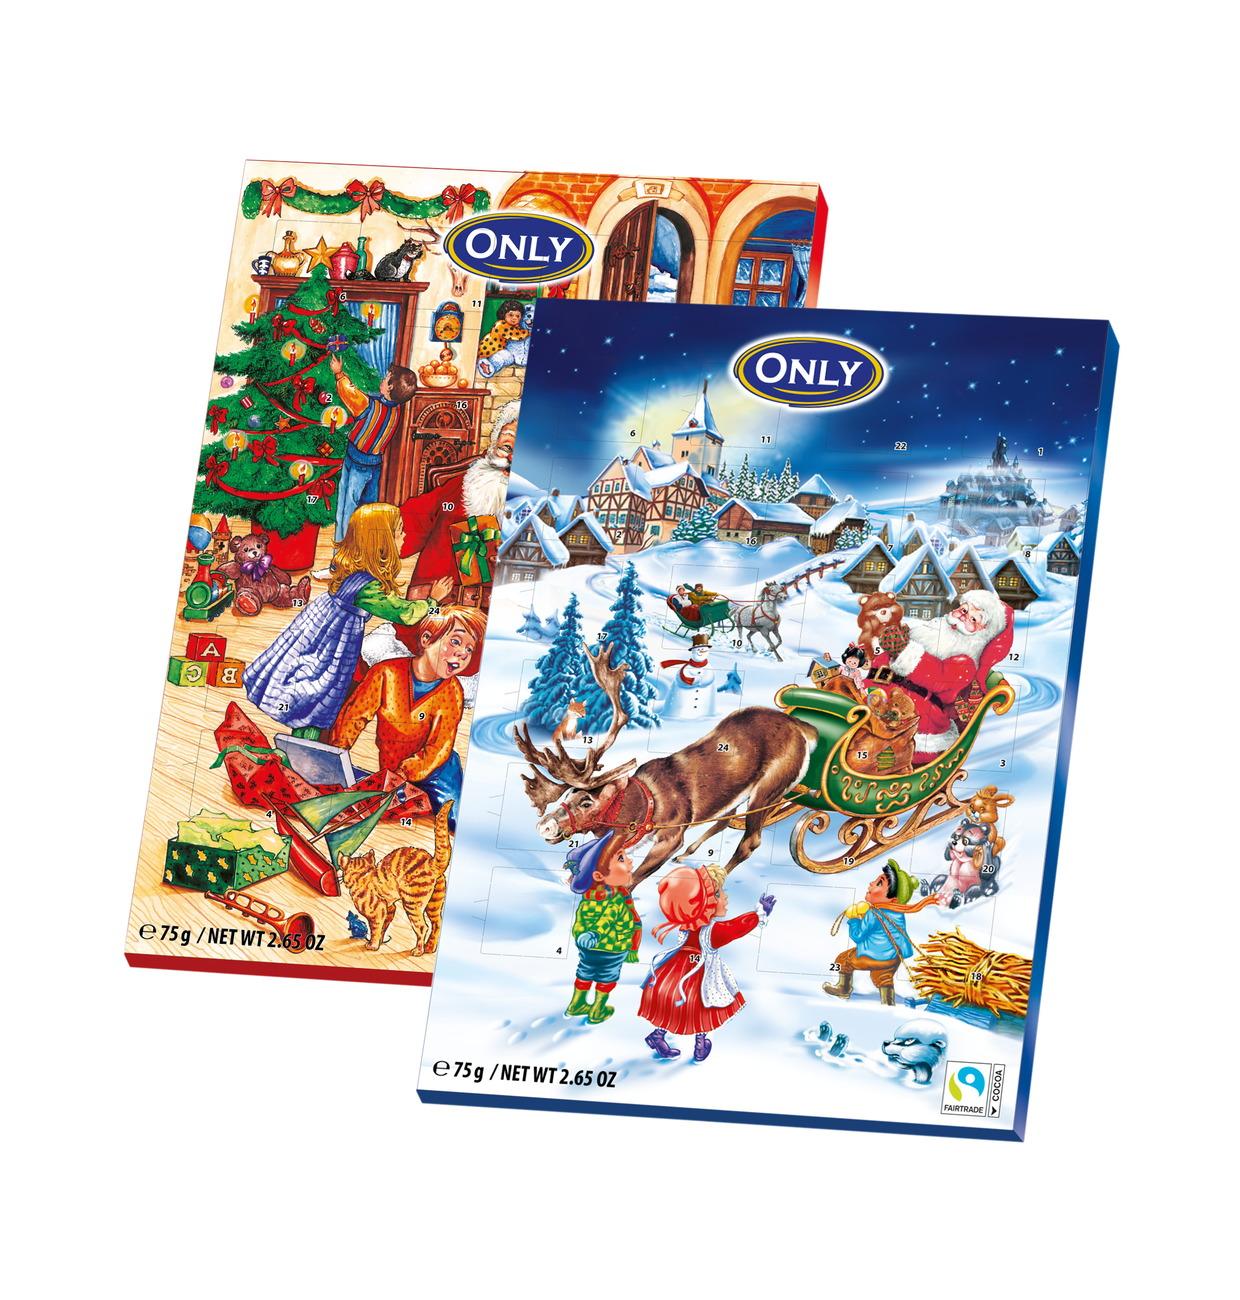 Calendario Avvento Cioccolato.Gunz Calendario Dell Avvento Con Cioccolato Al Latte 75g